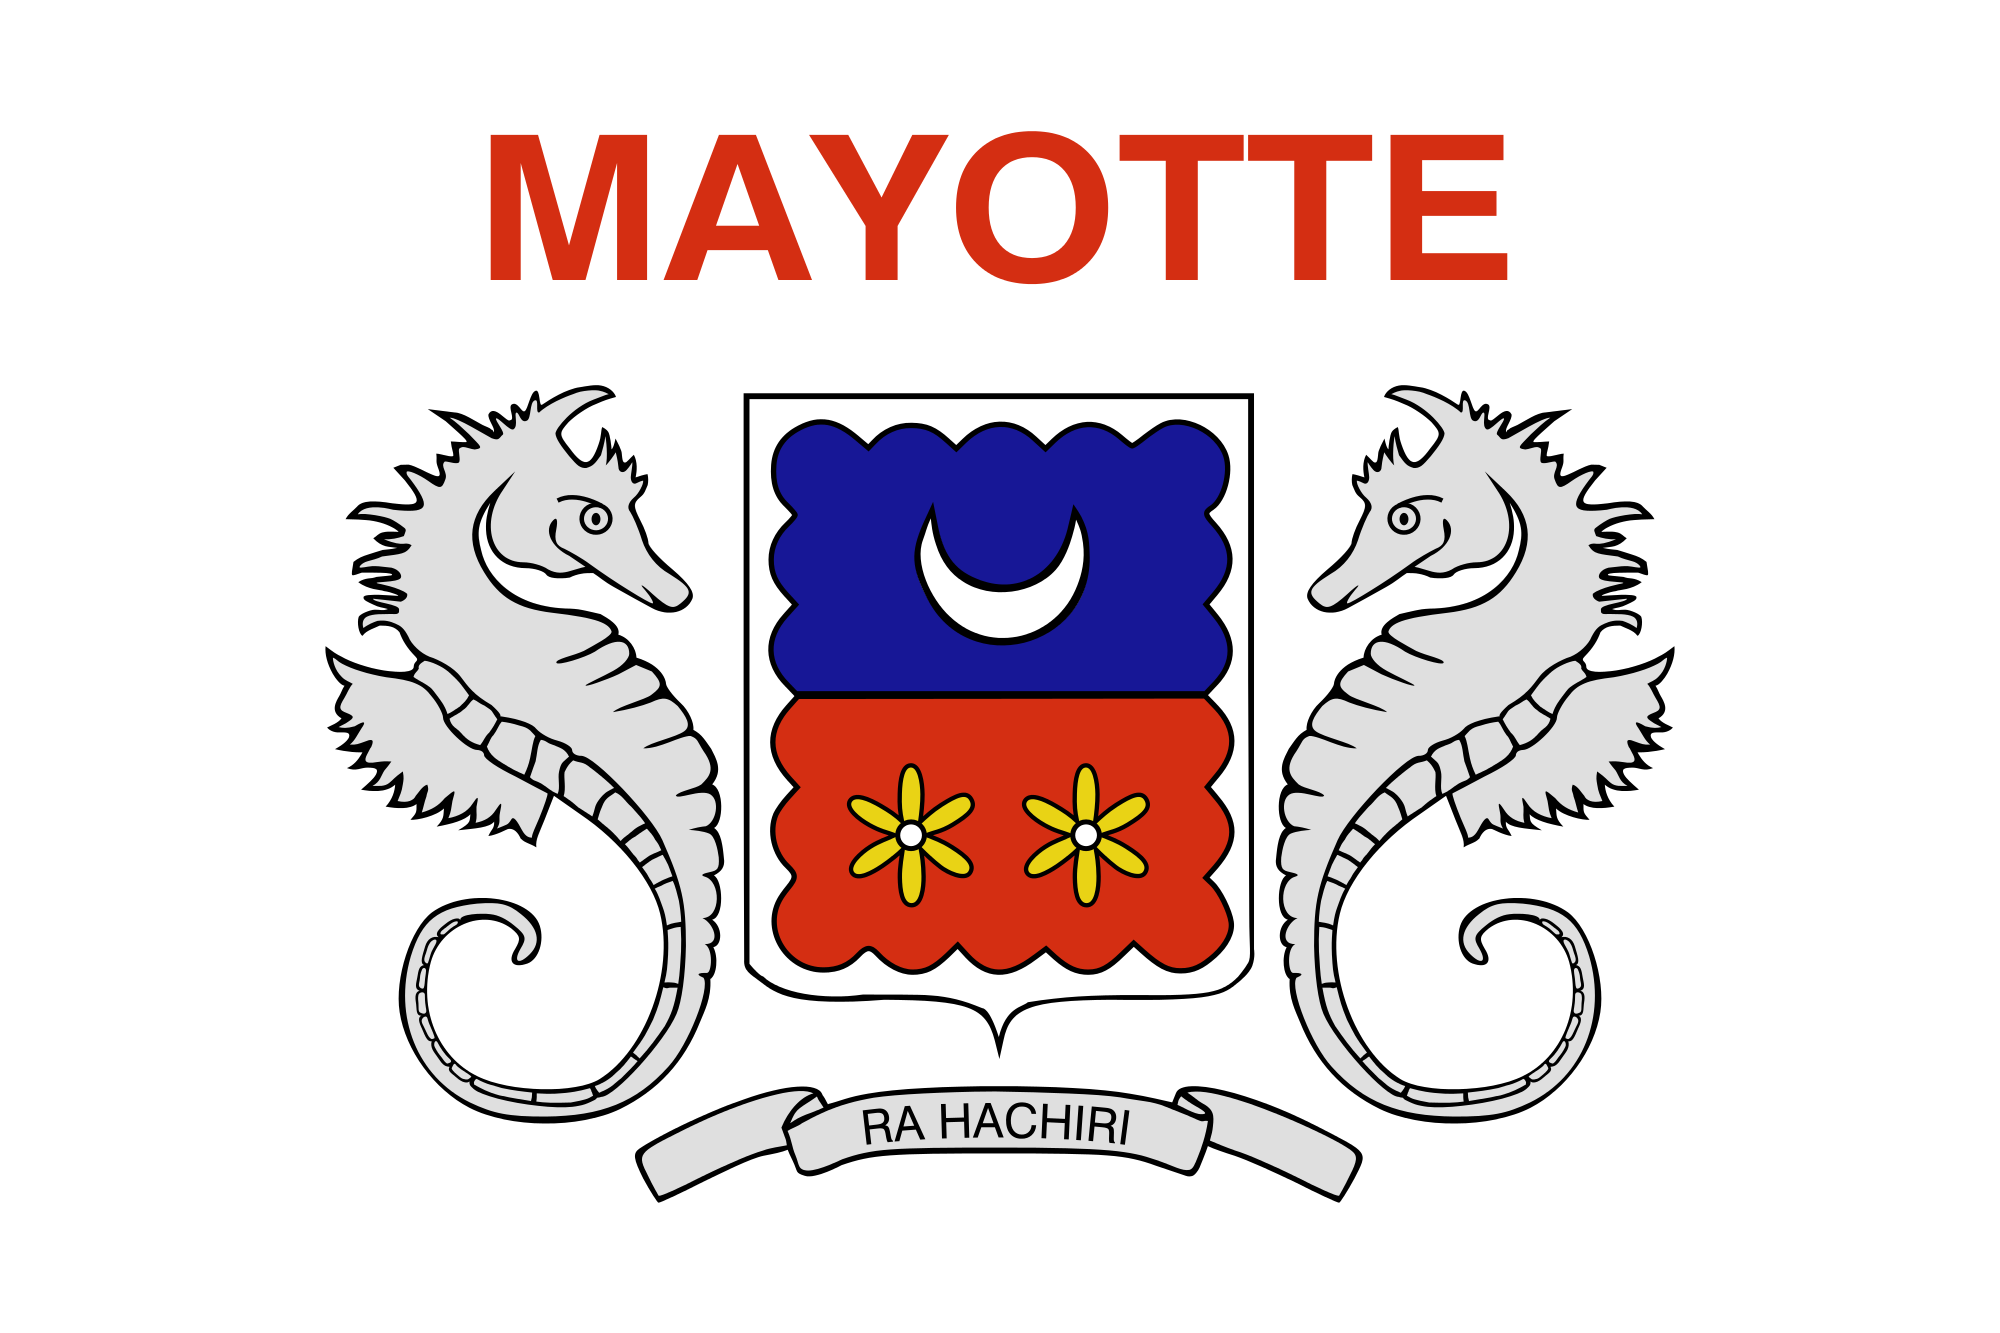 Travcour Visa & Legalisation Services Limited Mayotte Visa Application